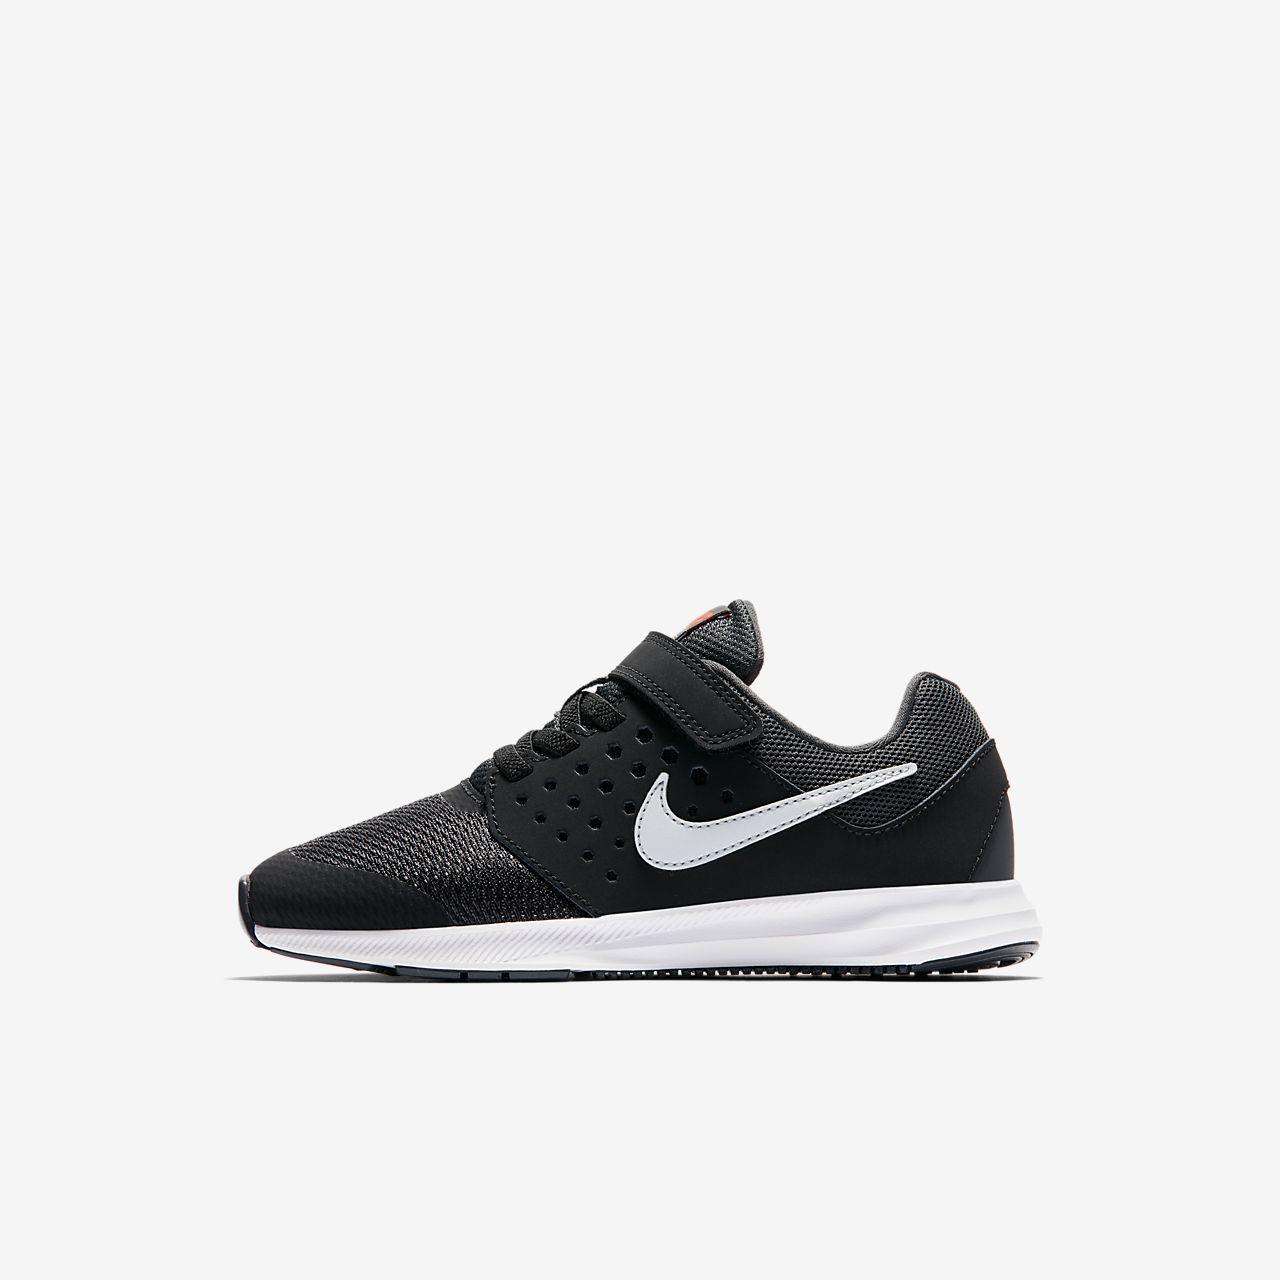 Nike Downshifter 7 - Boy Running Shoes - Black/Grey/Red